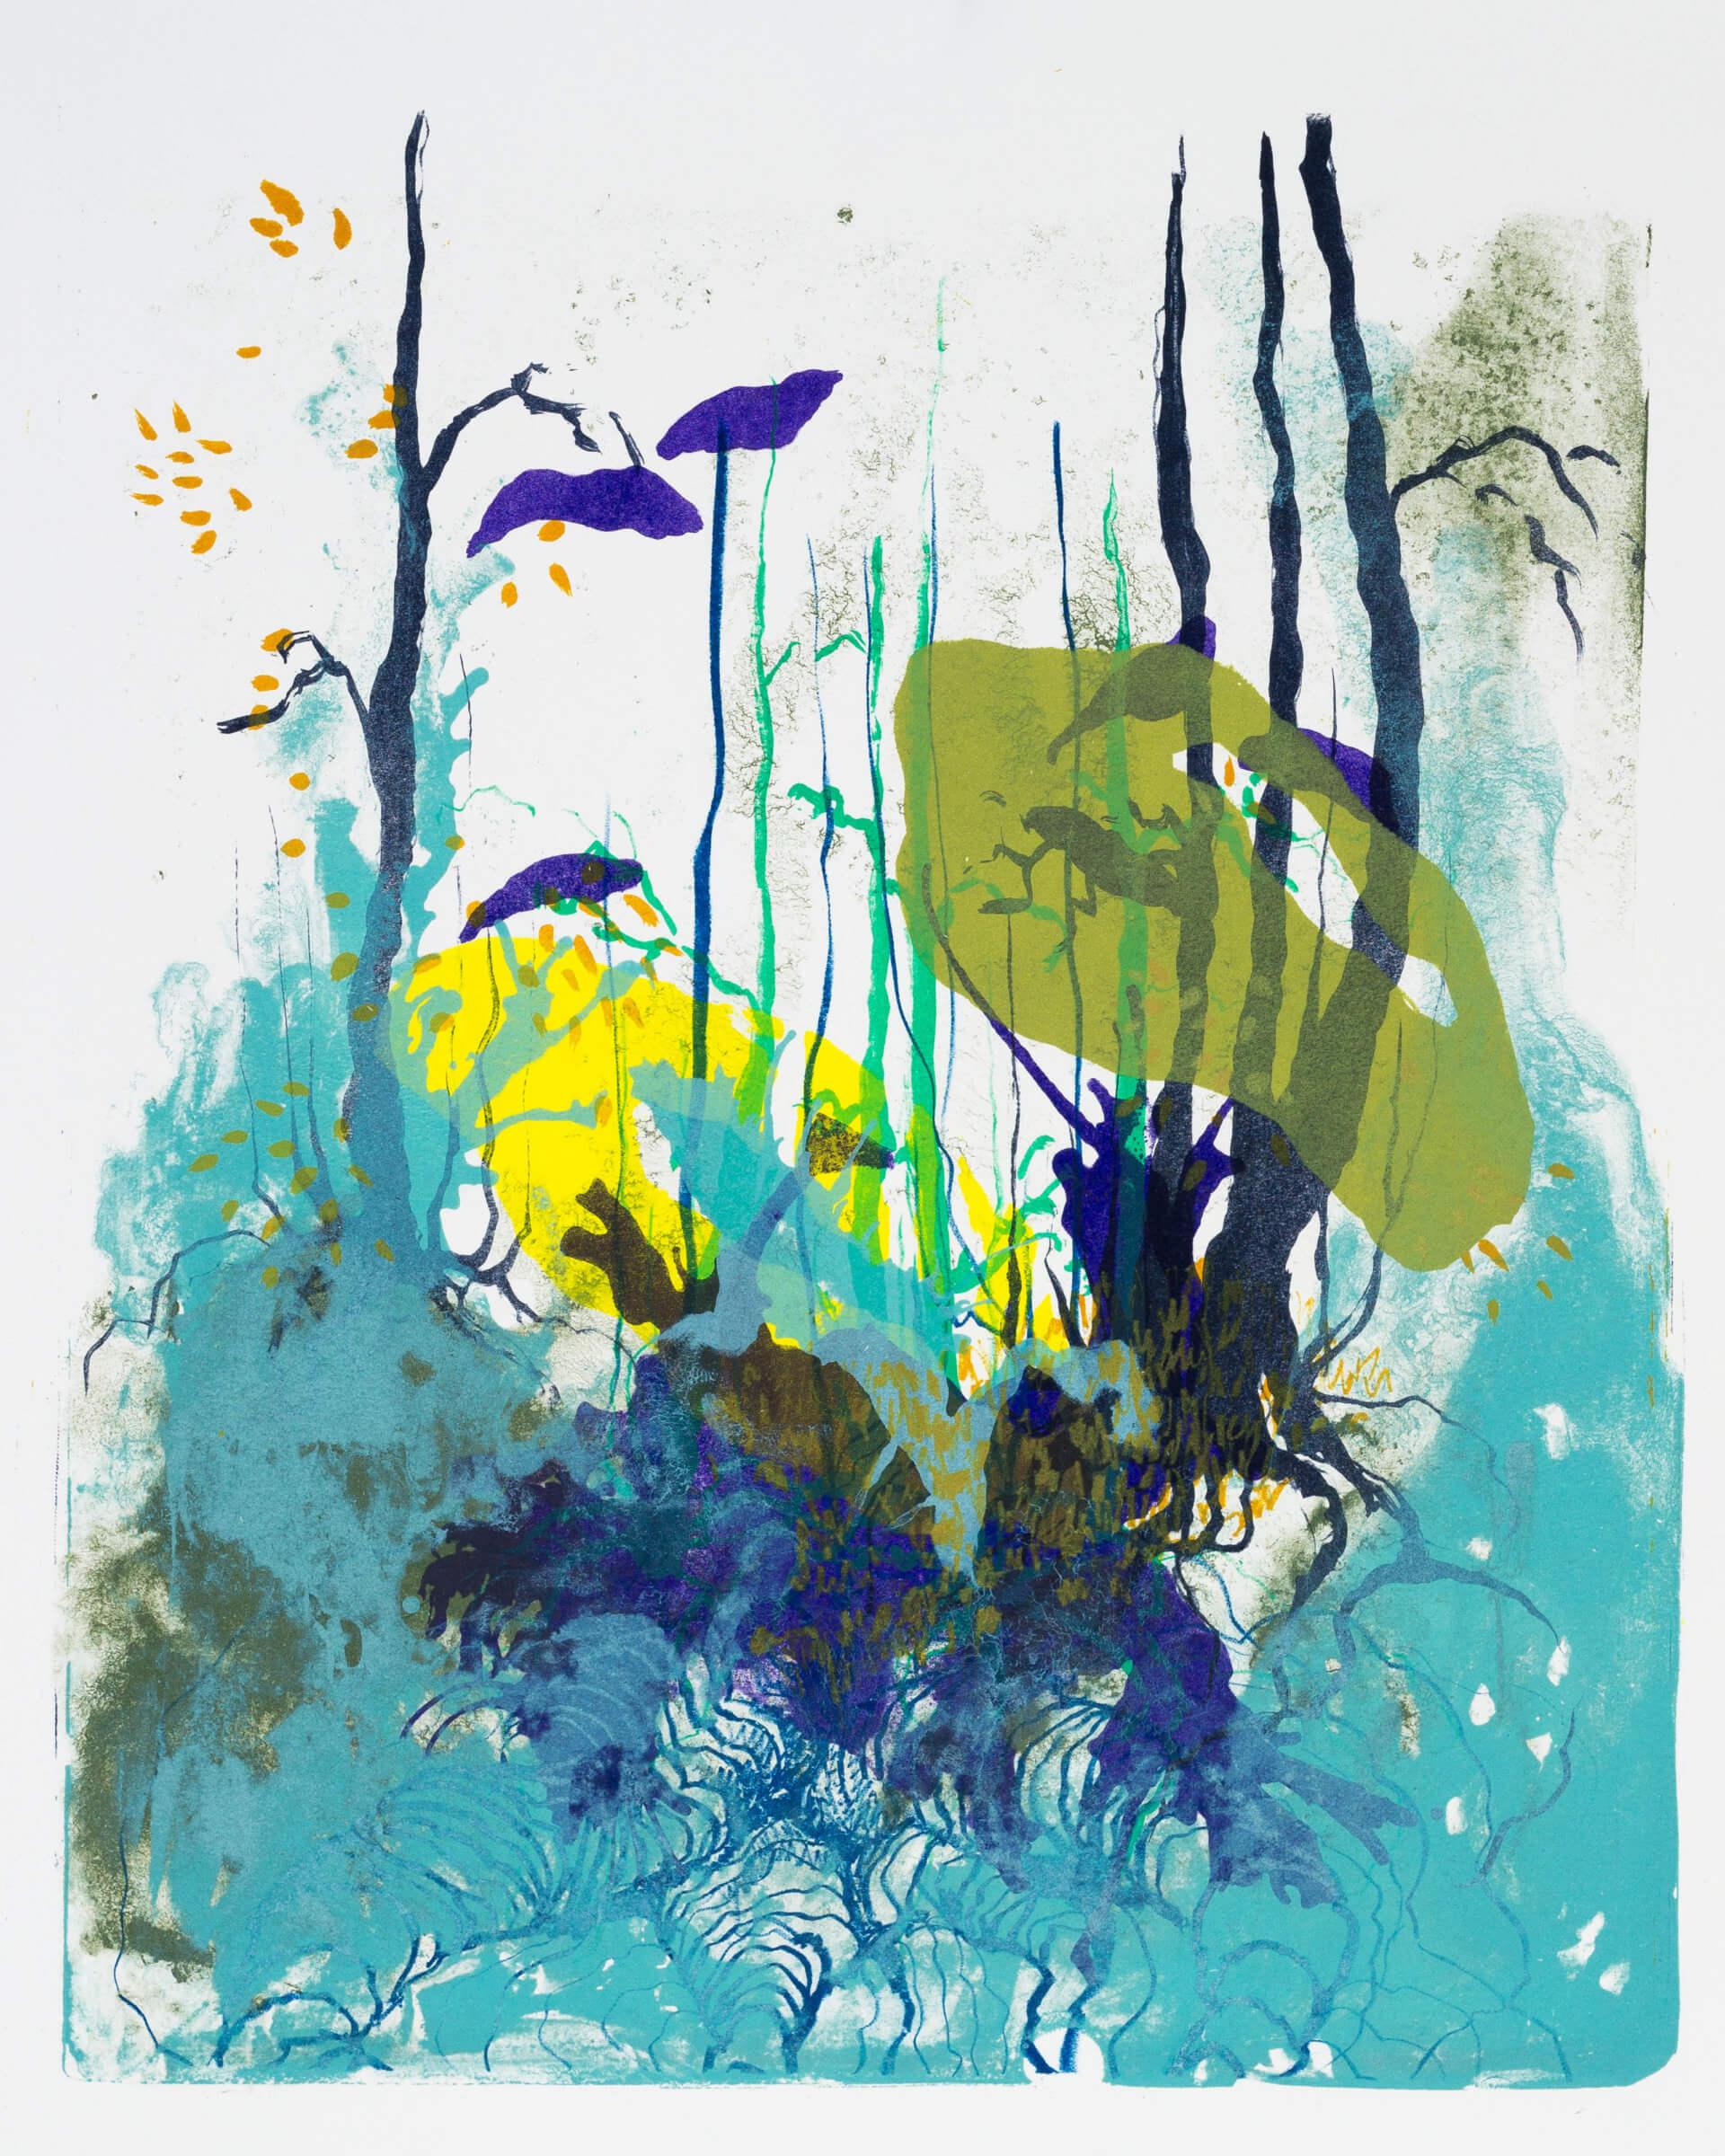 Wald X(S)-IX, 2020, Farblithographie, Unikat, 50x40 cm